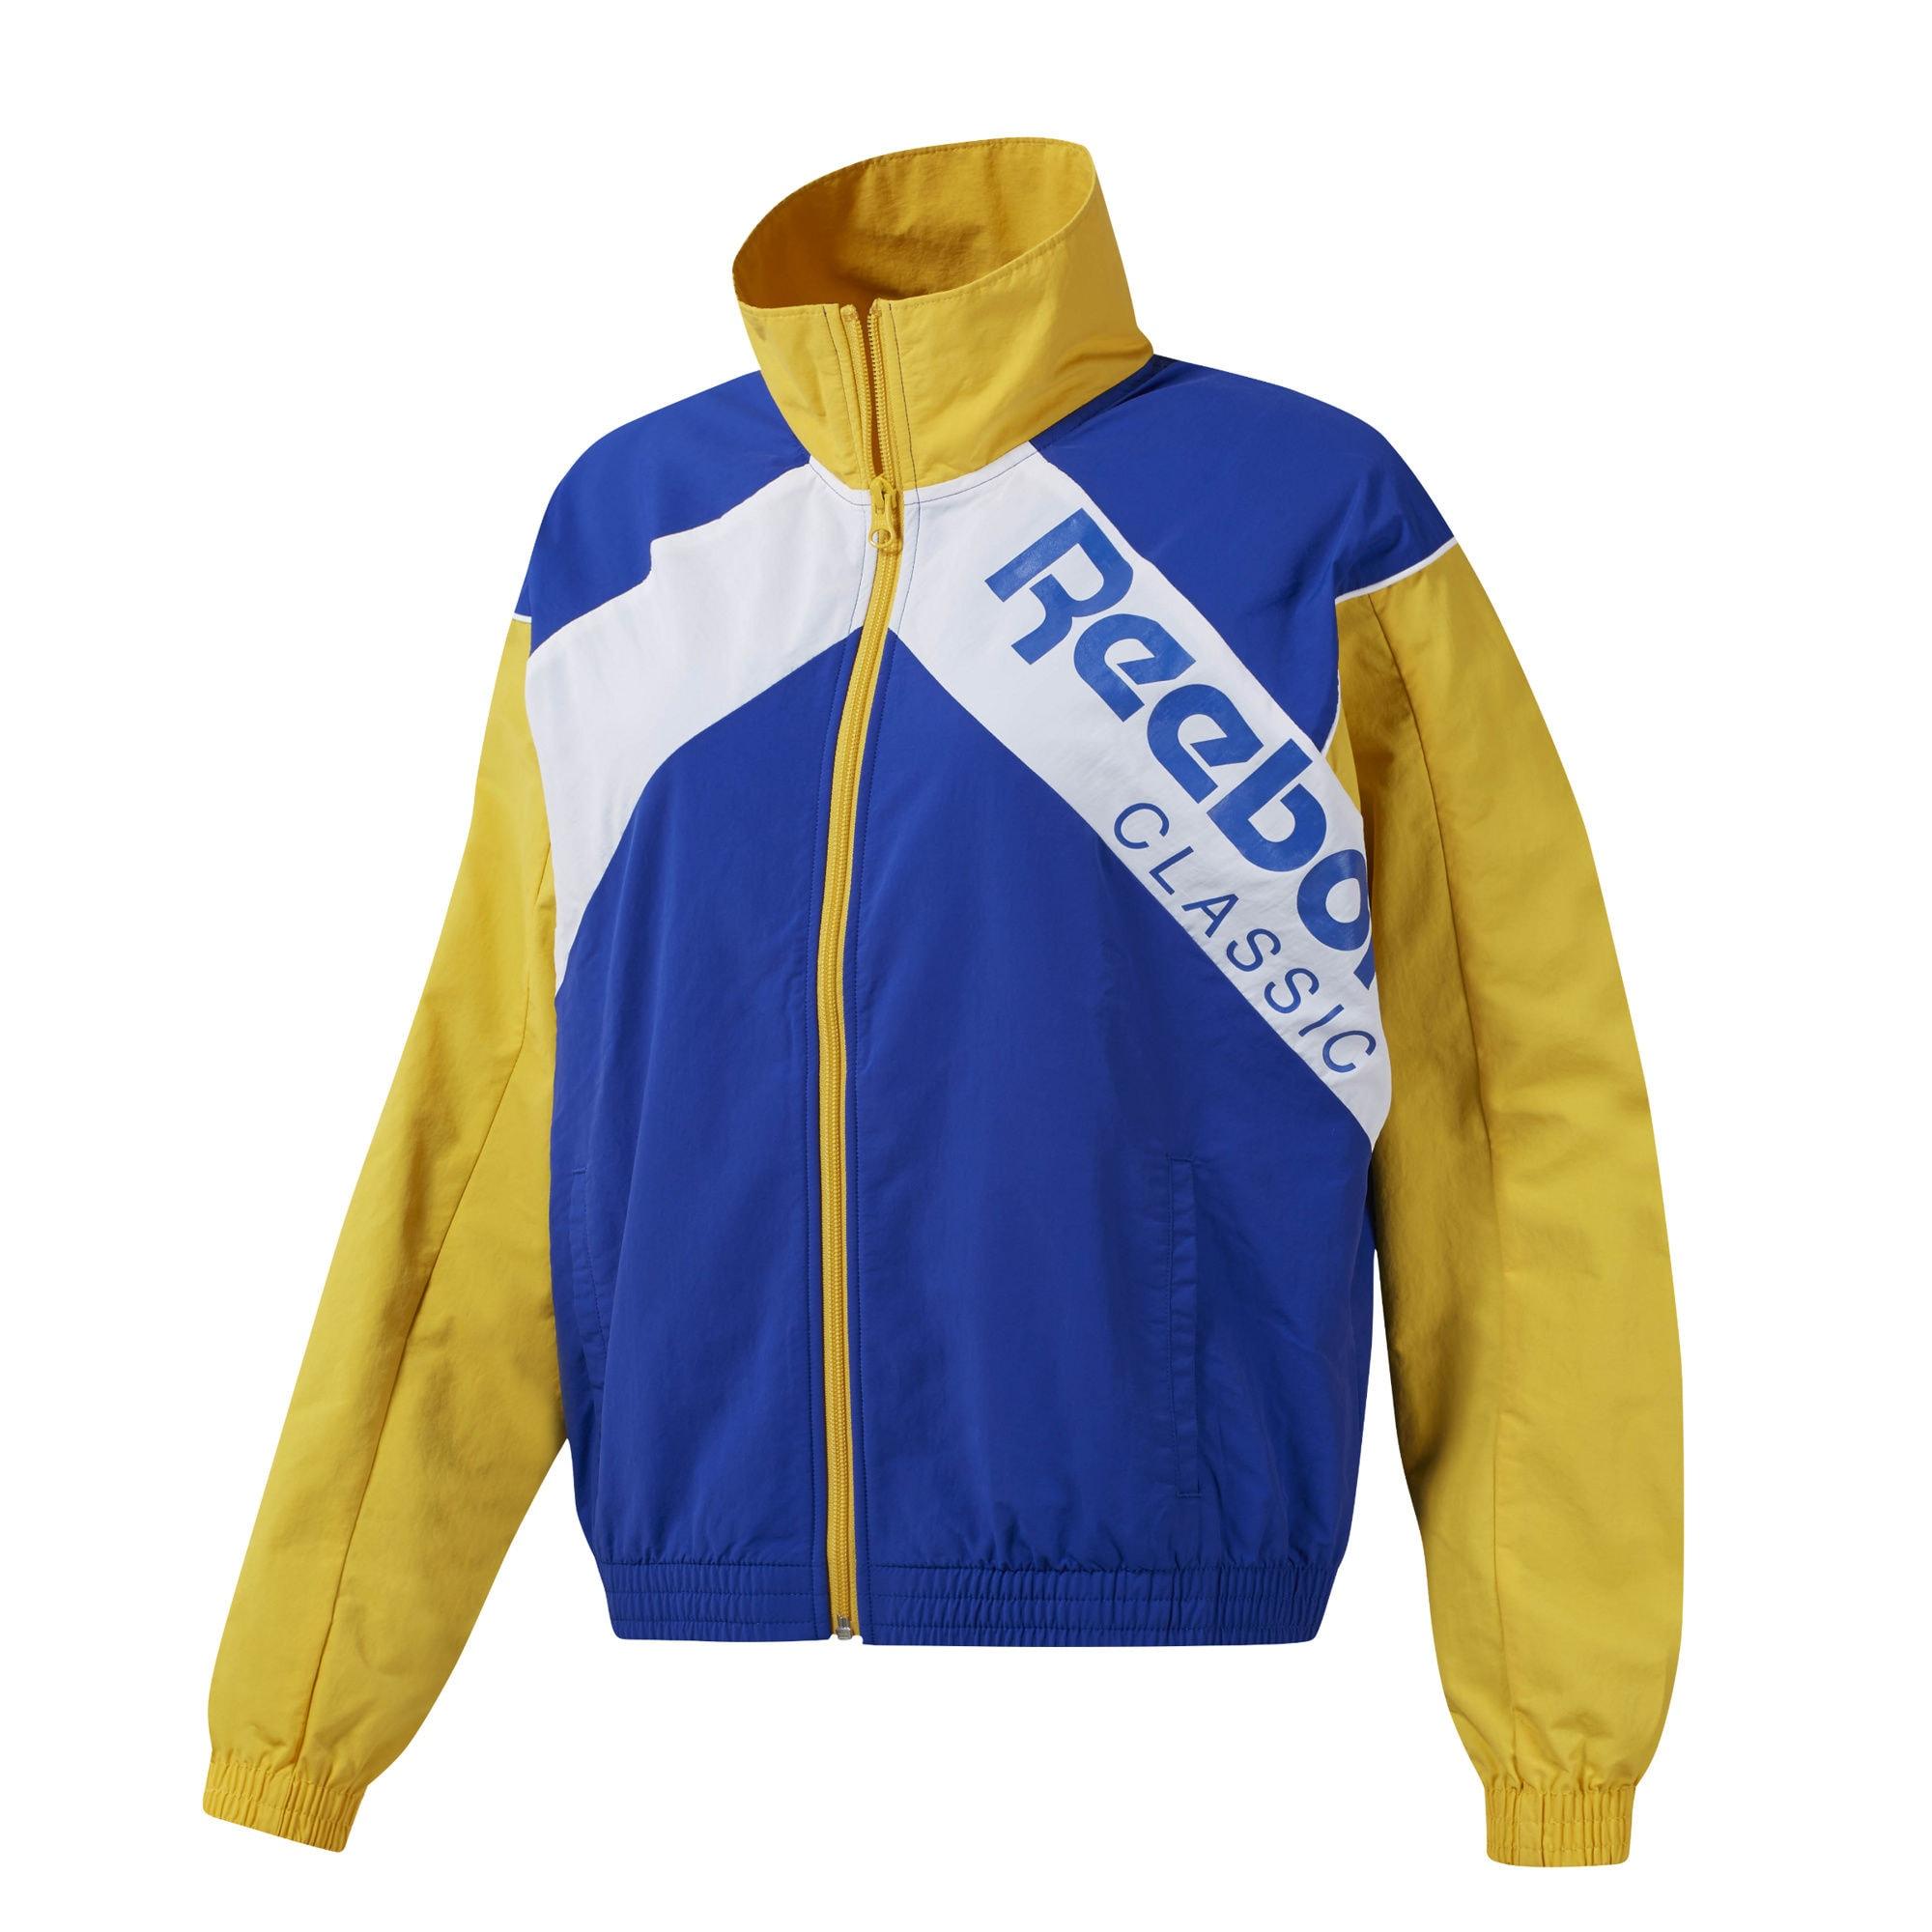 Trainingsjacke | Sportbekleidung > Sportjacken > Trainingsjacken | Blau - Gelb - Weiß | Reebok Classic